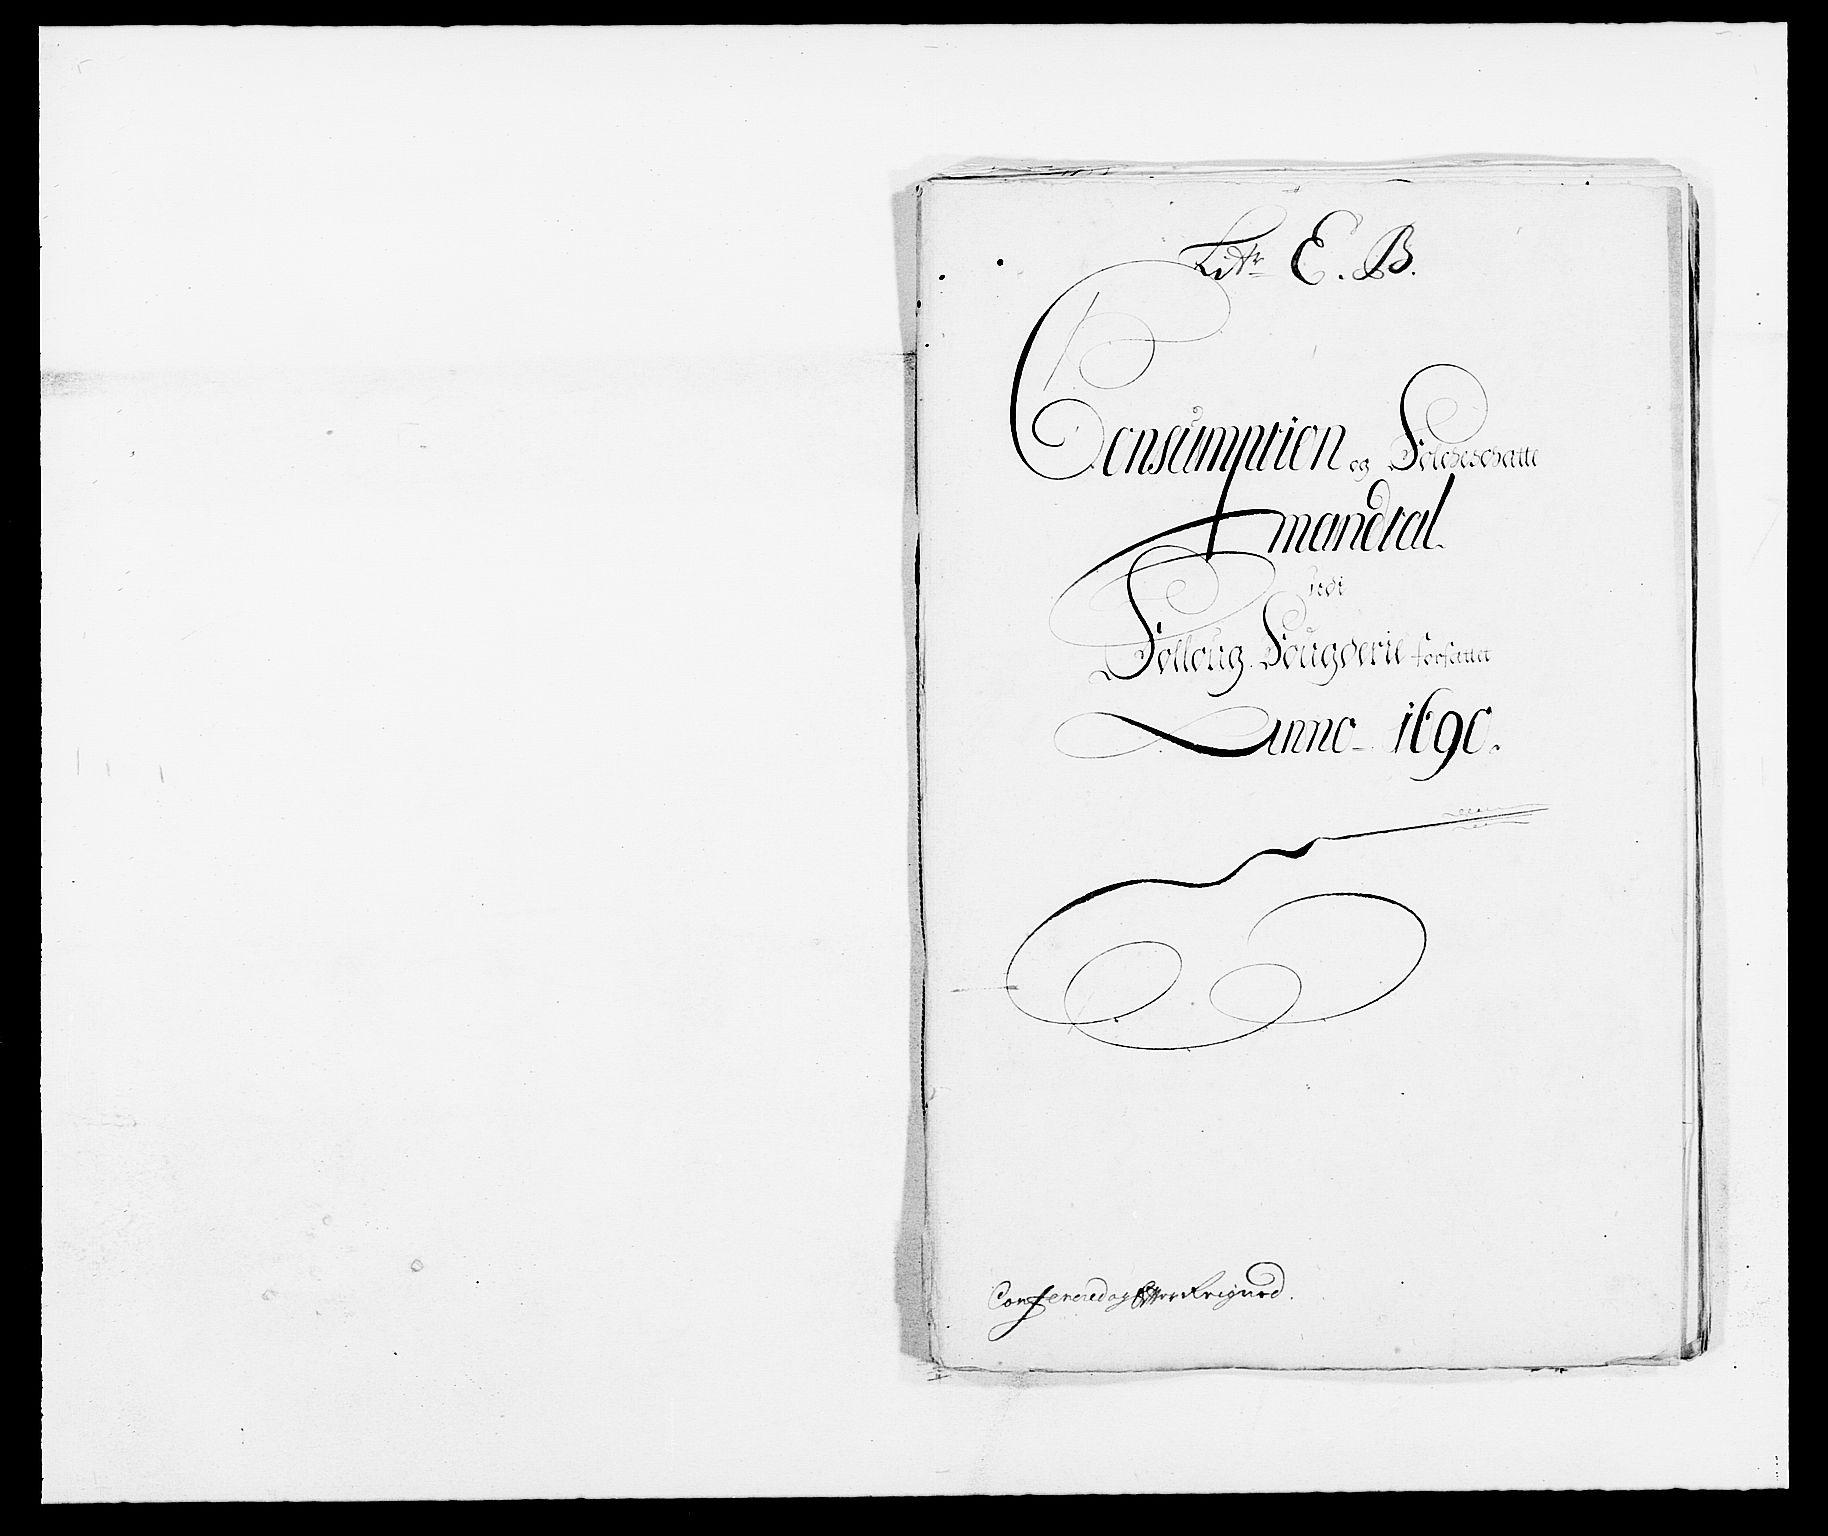 RA, Rentekammeret inntil 1814, Reviderte regnskaper, Fogderegnskap, R09/L0435: Fogderegnskap Follo, 1689-1691, s. 360